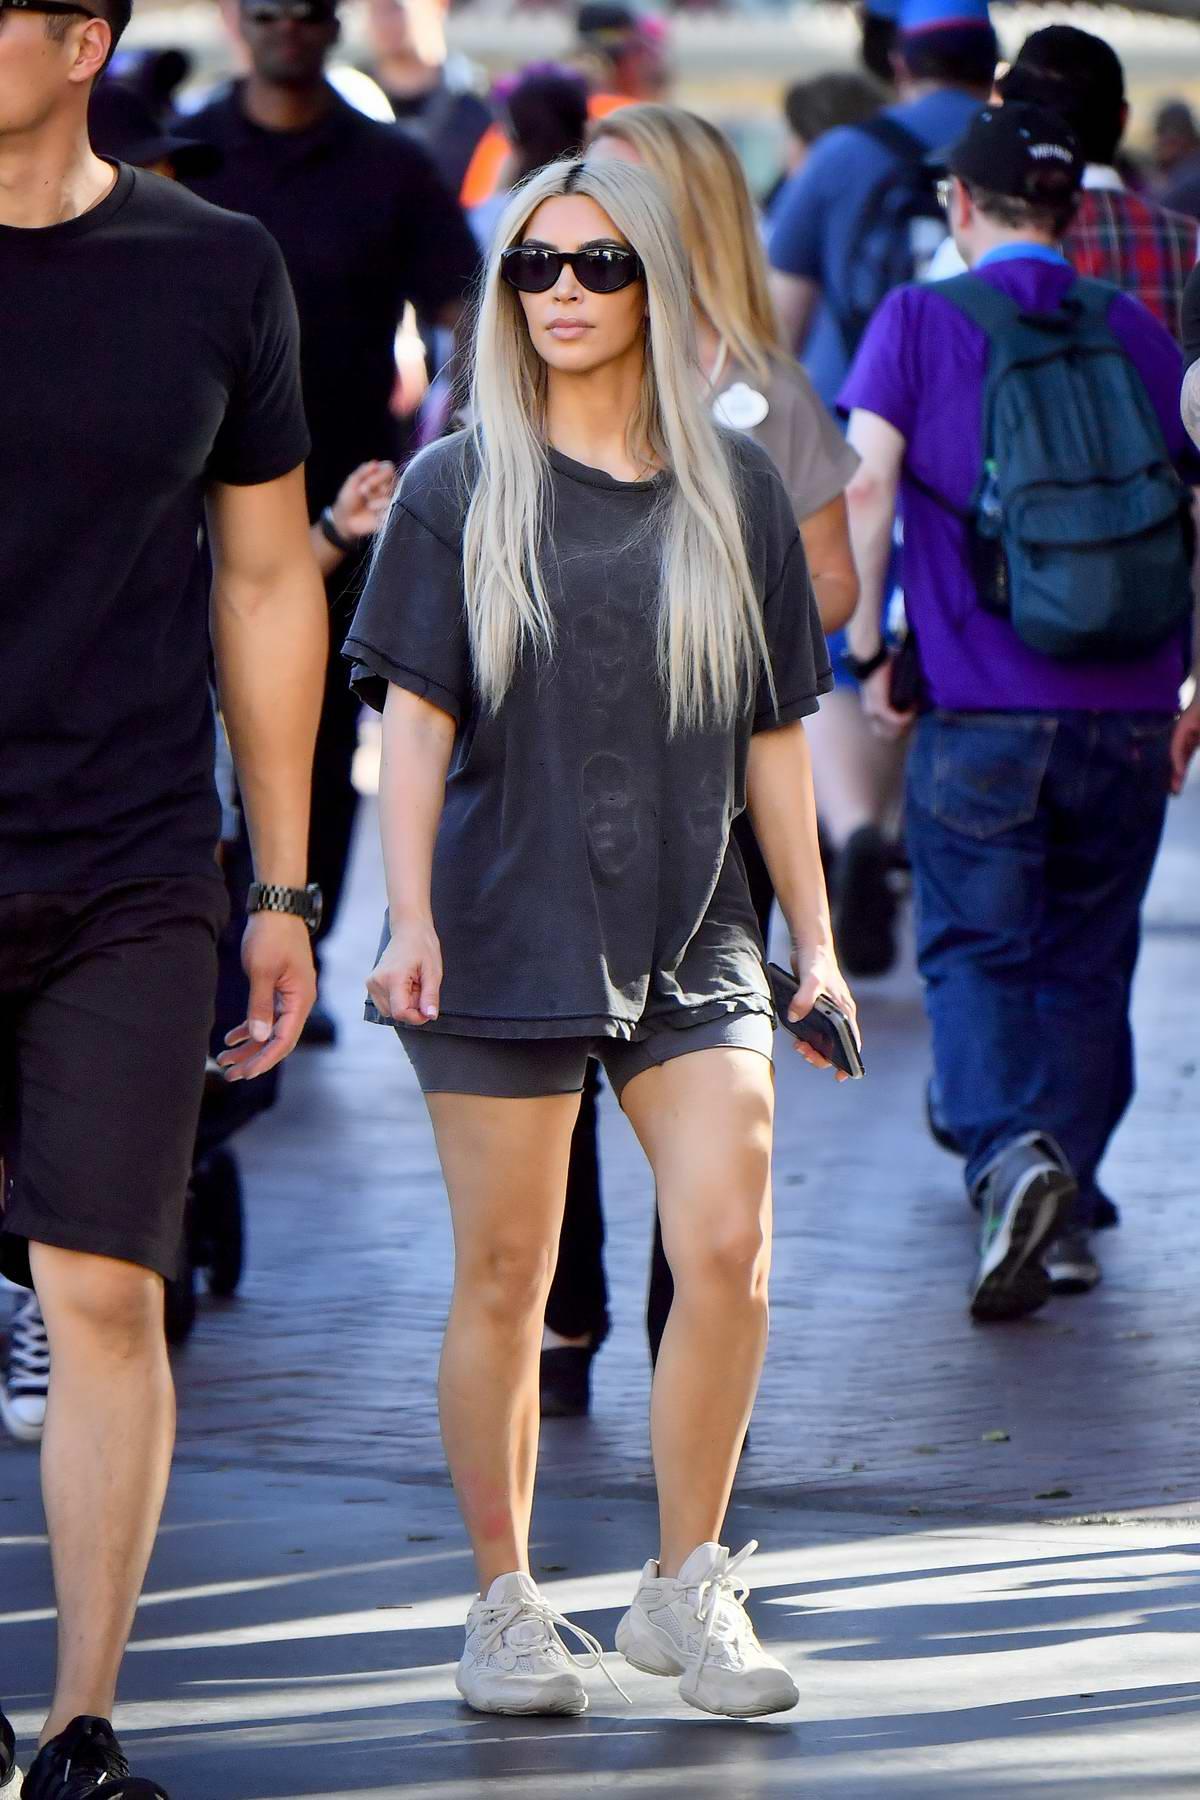 Kim Kardashian celebrates her 37th birthday at Disneyland in Anaheim, California